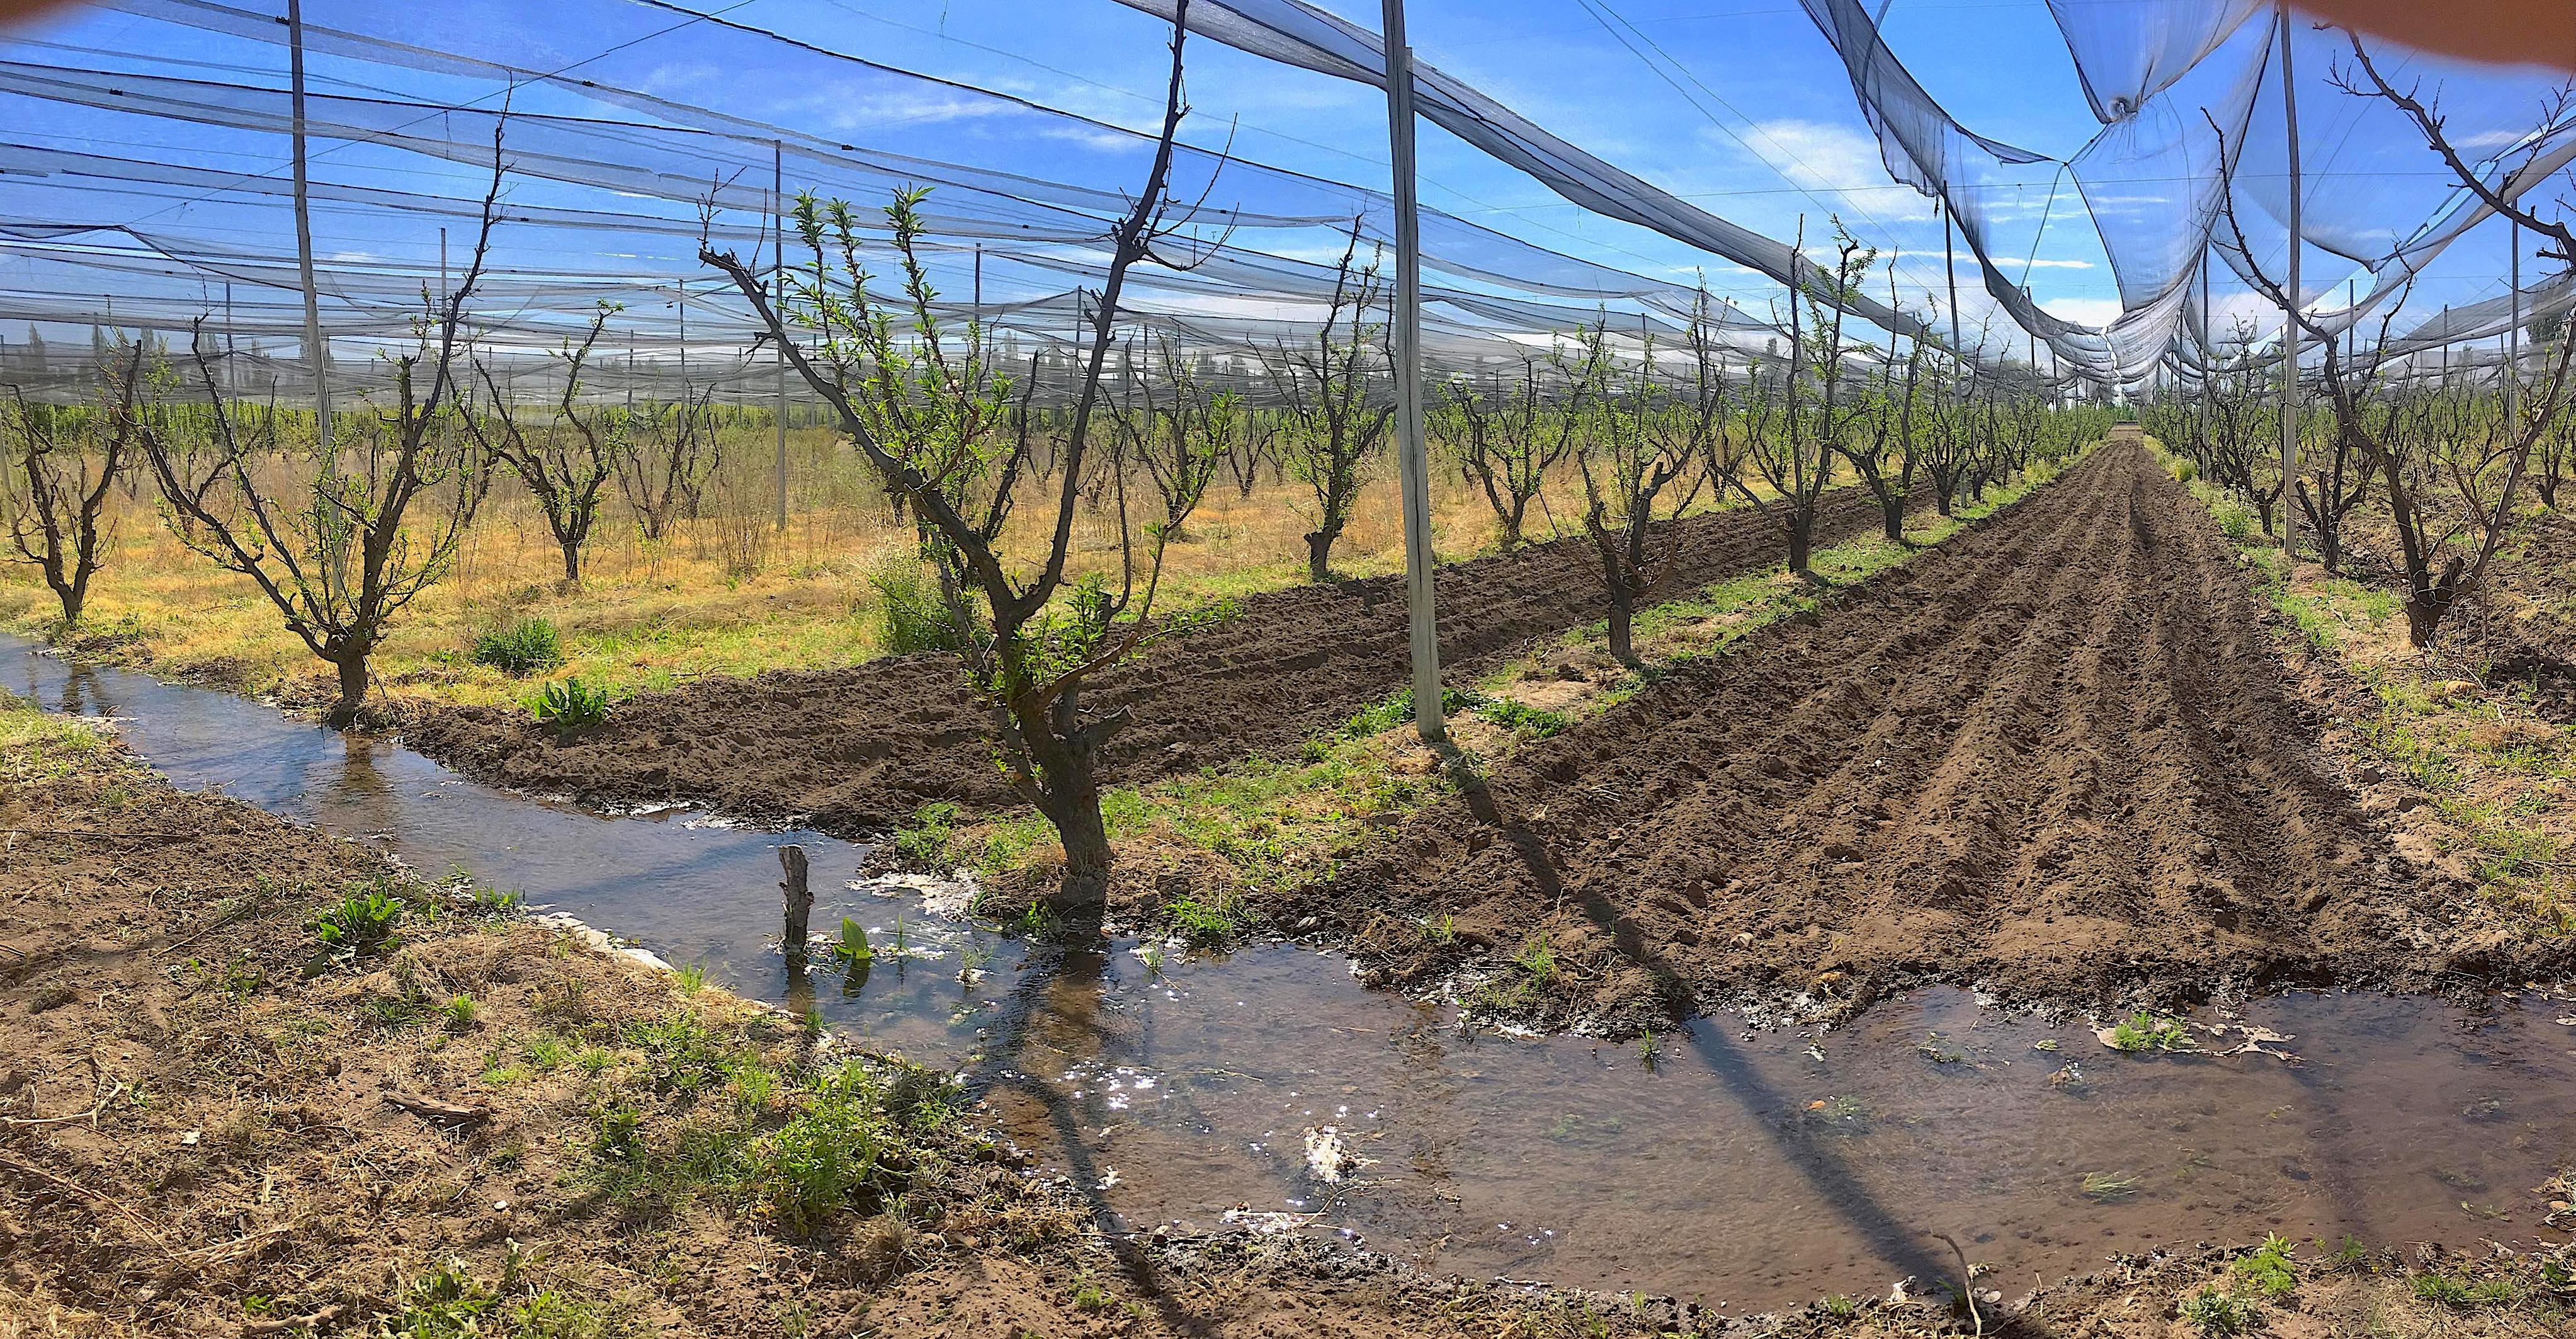 plum_orchard